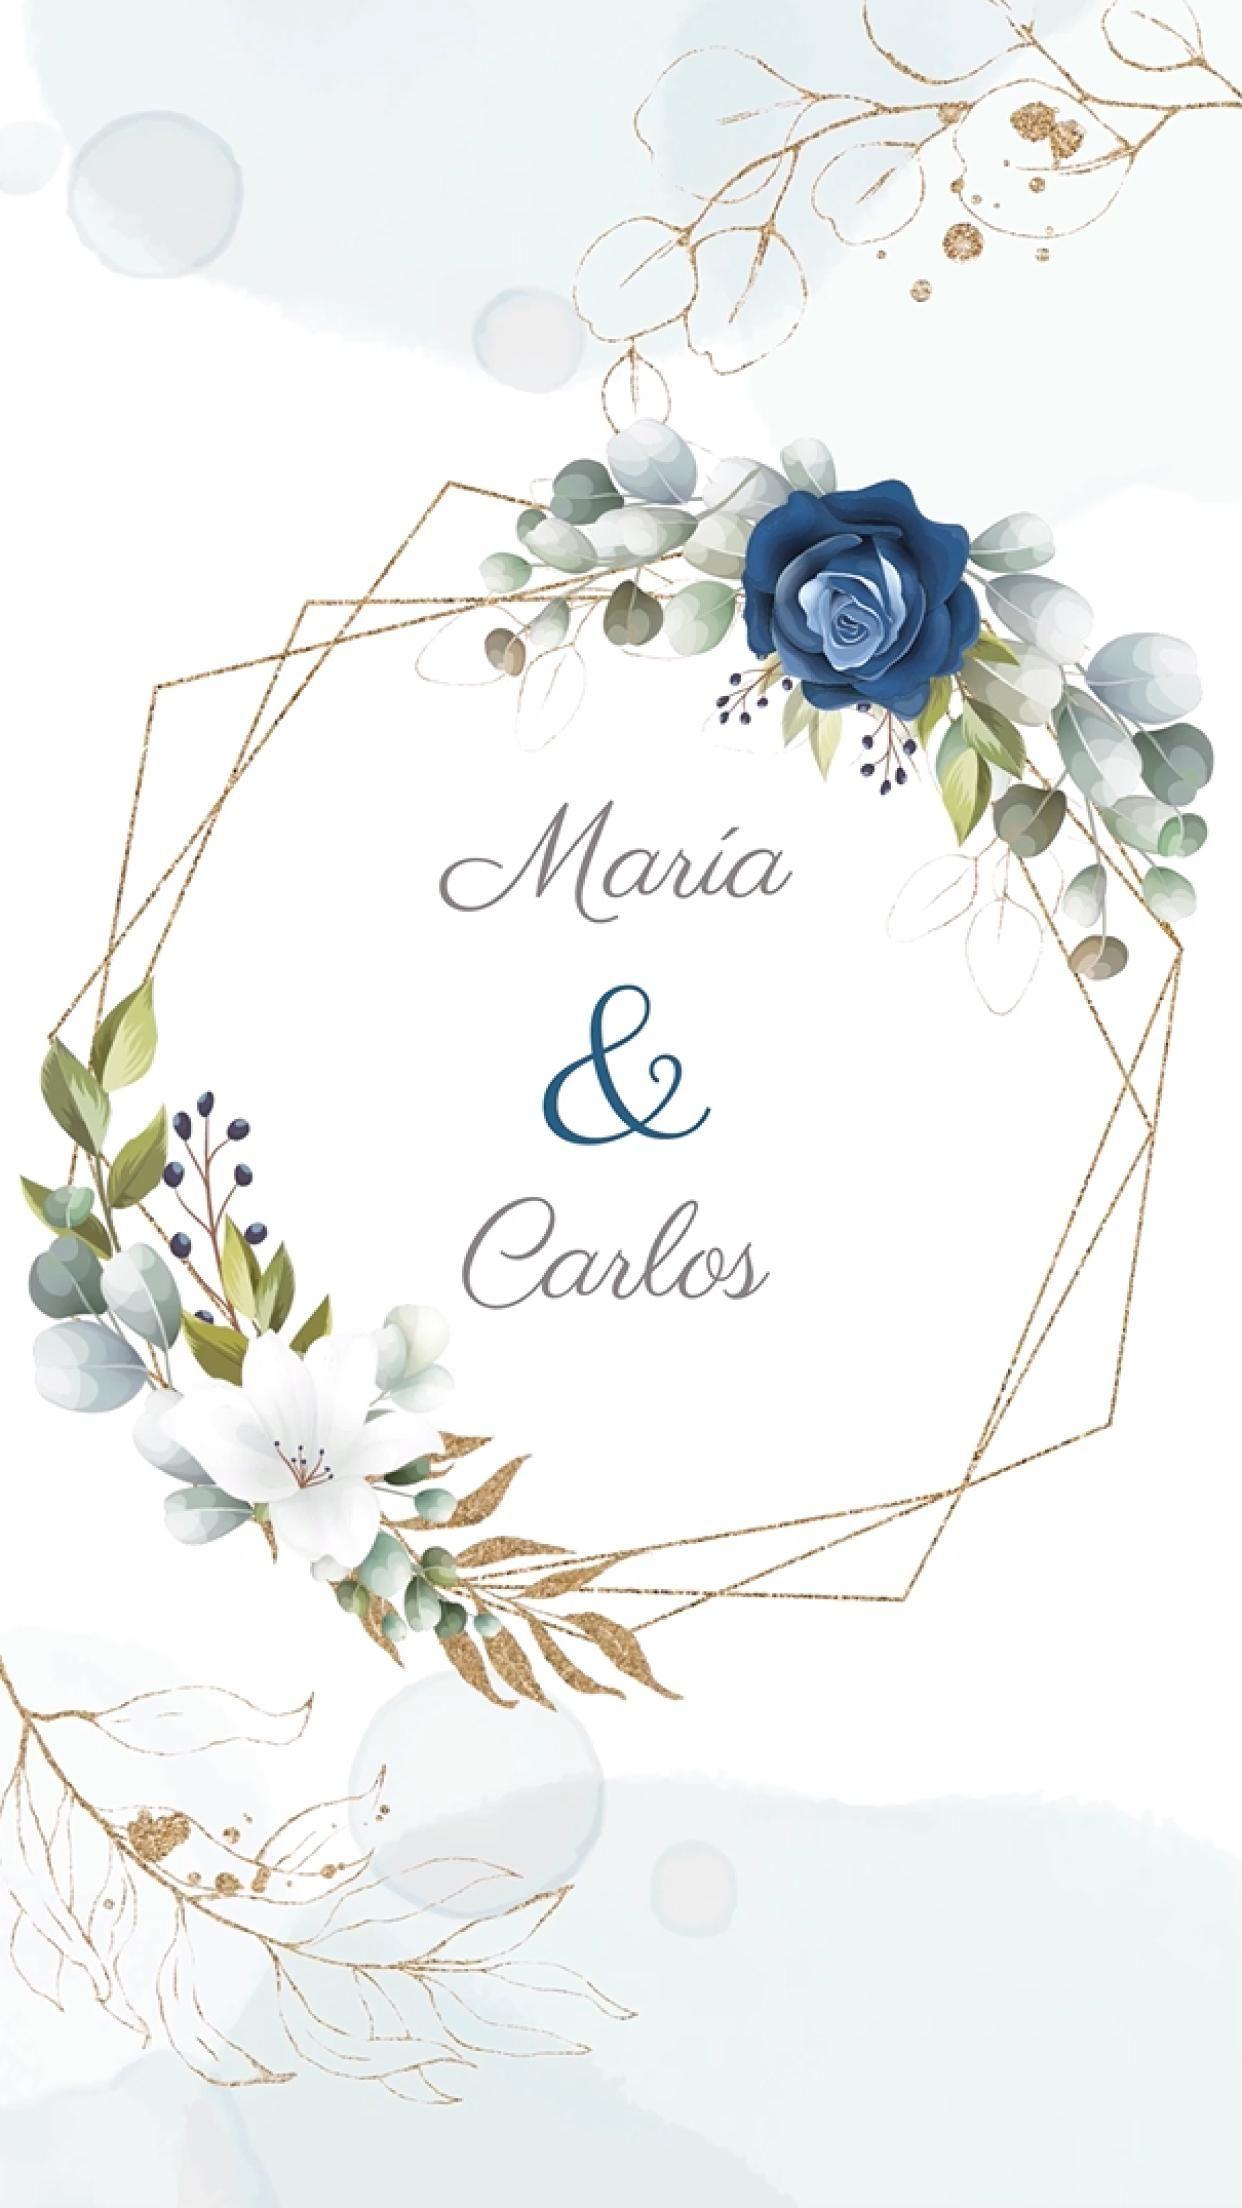 Video Video Invitacion Digital Boda Casamiento Quinceanera 15 Anos E Card Invite Arroz De Co Kartu Pernikahan Kartu Undangan Pernikahan Contoh Undangan Pernikahan